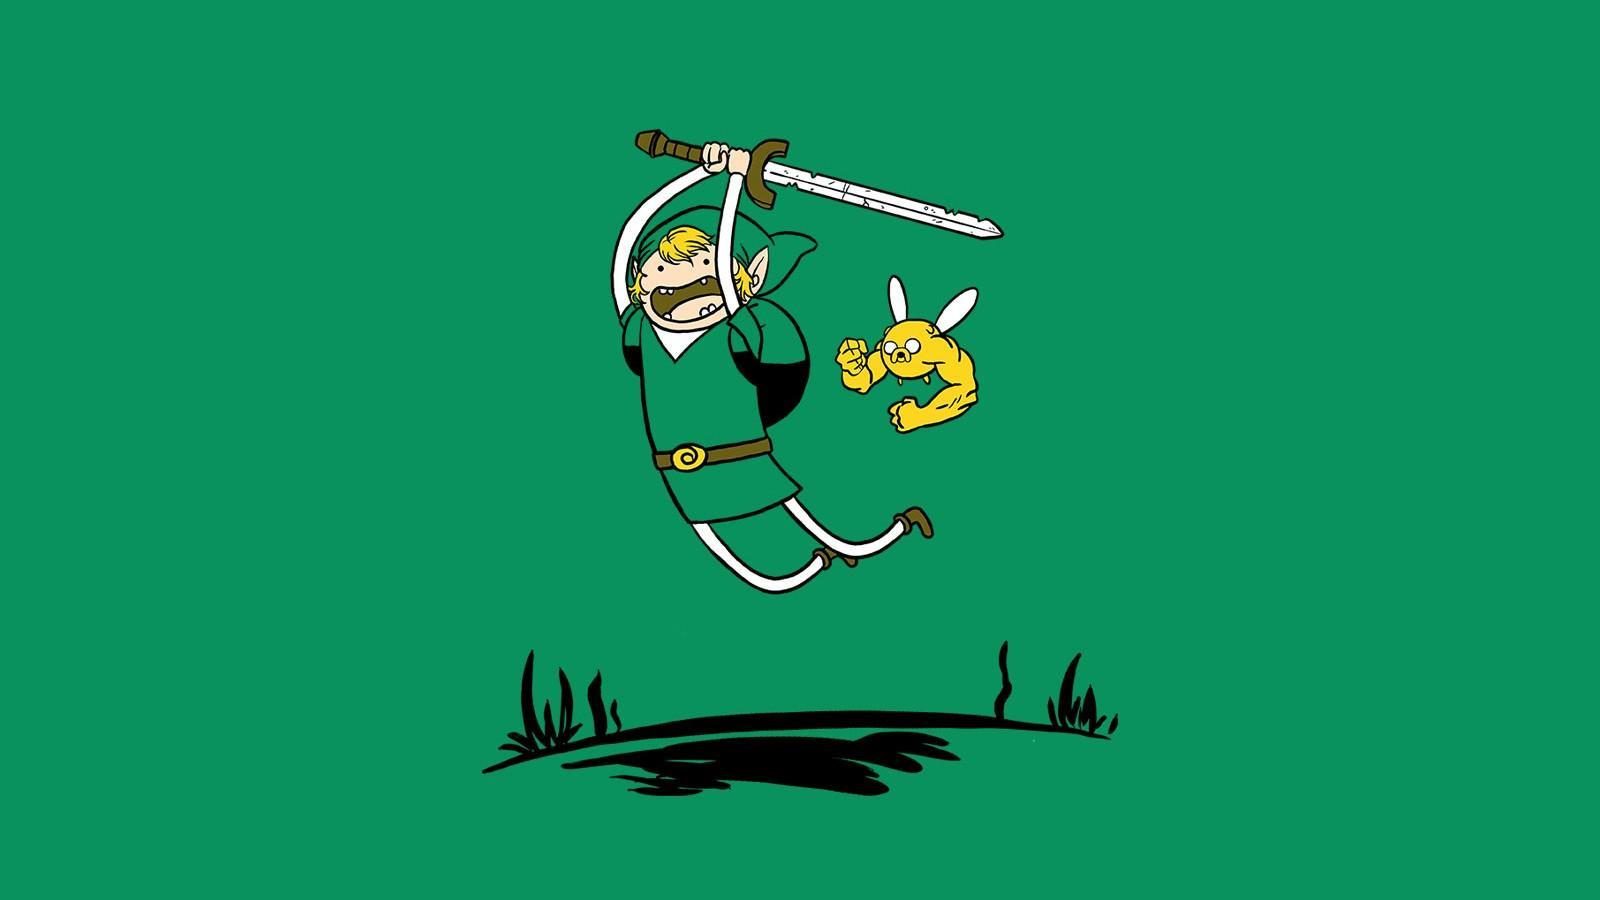 Wallpaper : Adventure Time, The Legend